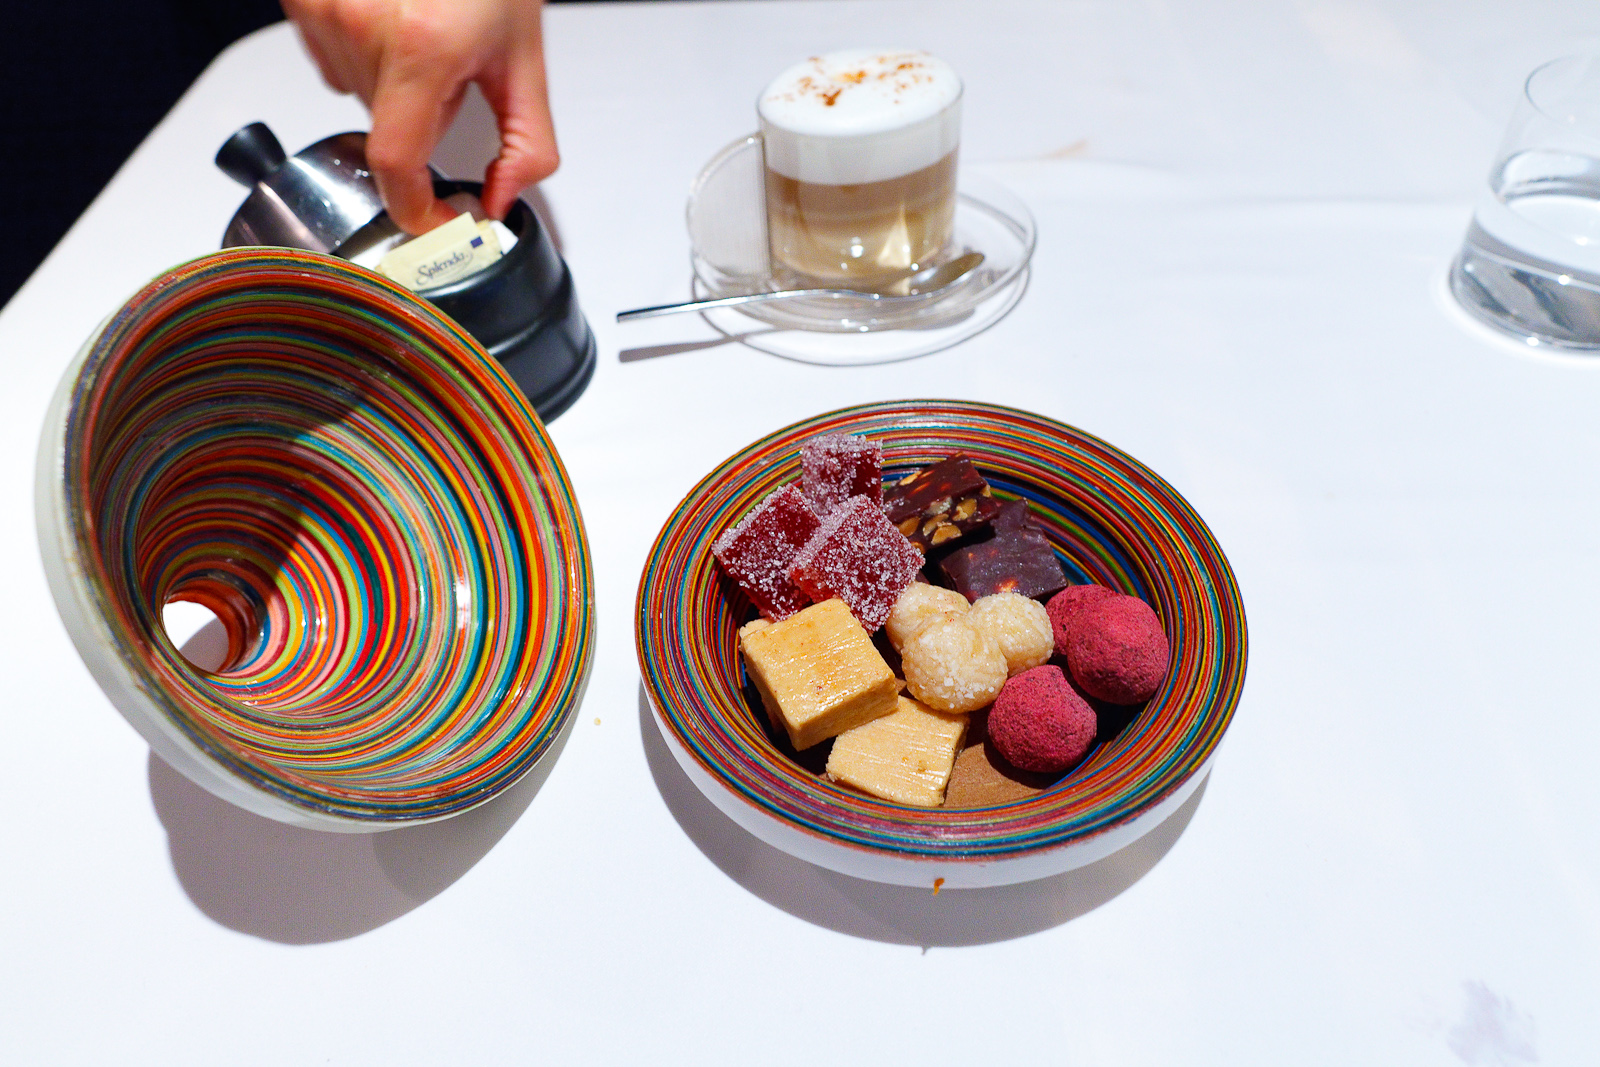 Petits fours: pâte des fruits, chocolate and hazelnuts, cocada (coconut ball), chocolate, Mexican mazapán (peanut squares)